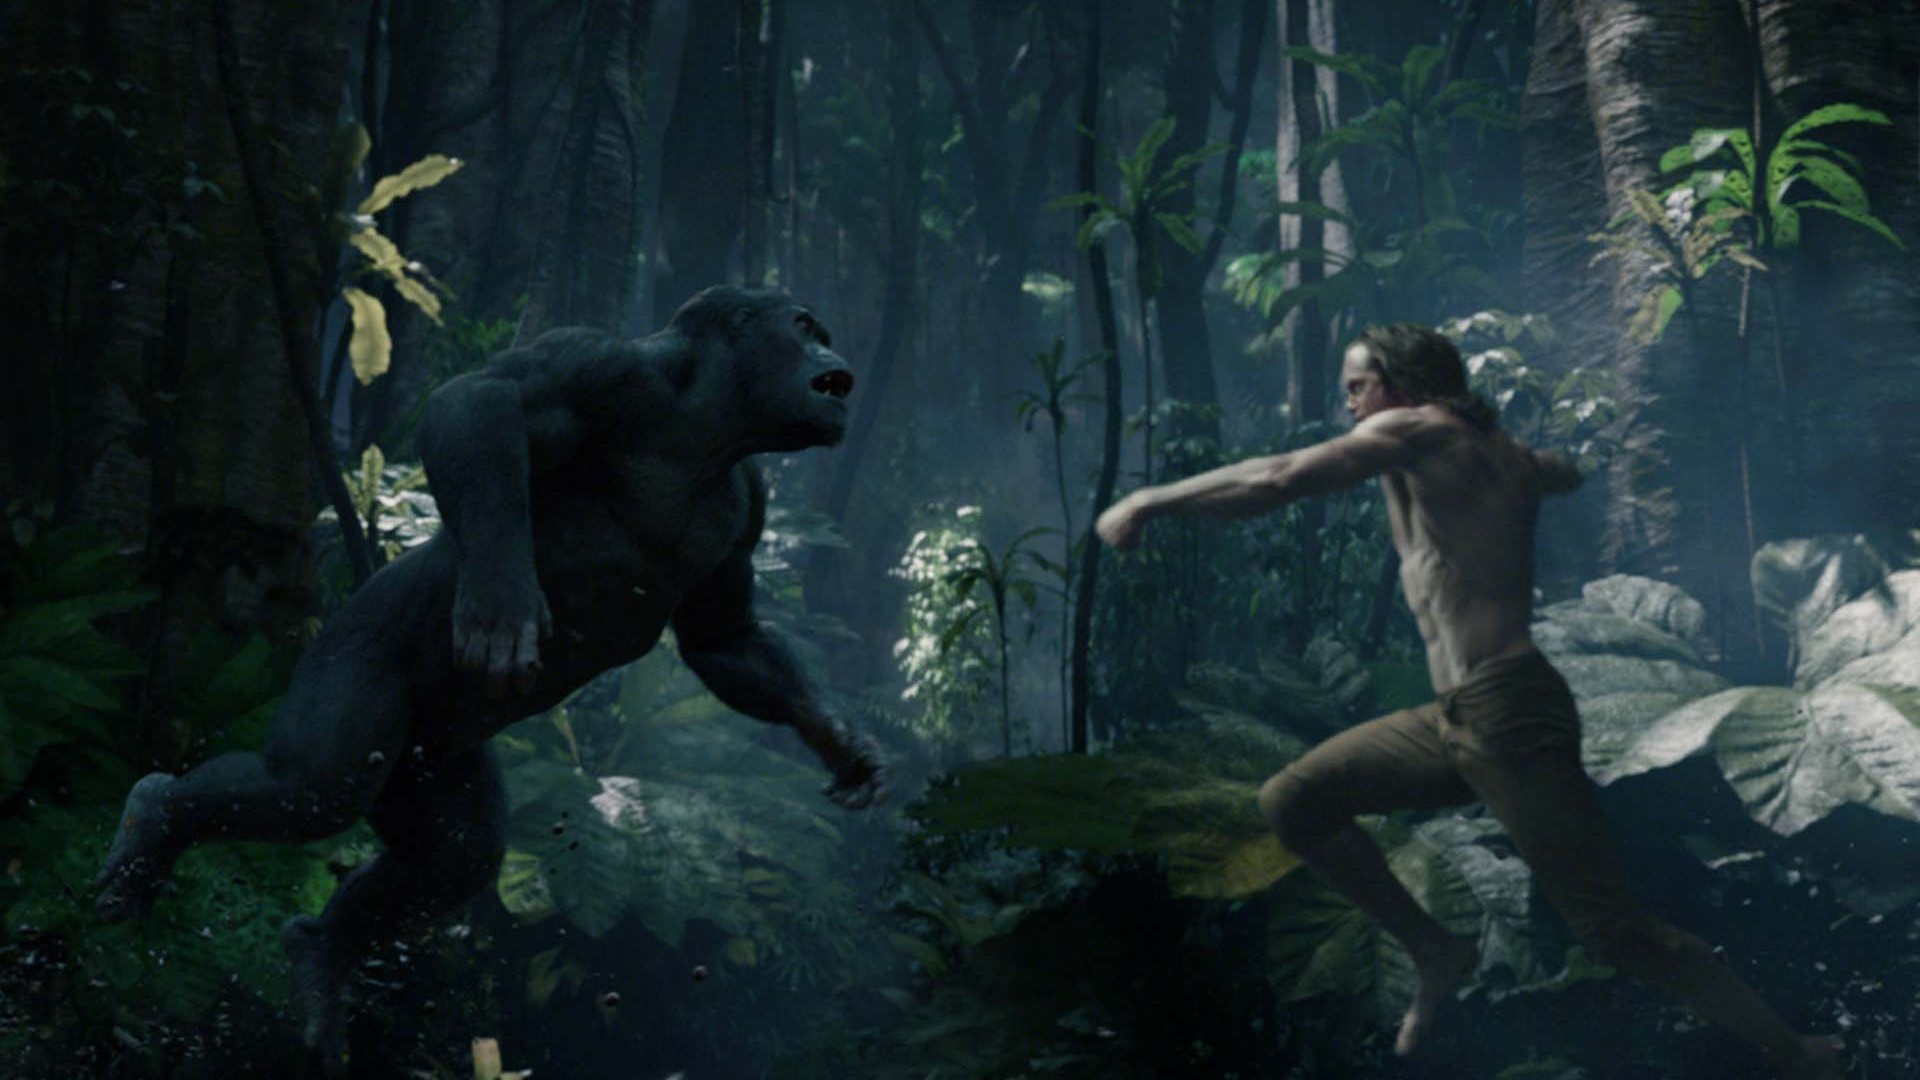 Alexander Skarsgård The Legend of Tarzan Square Mile interview